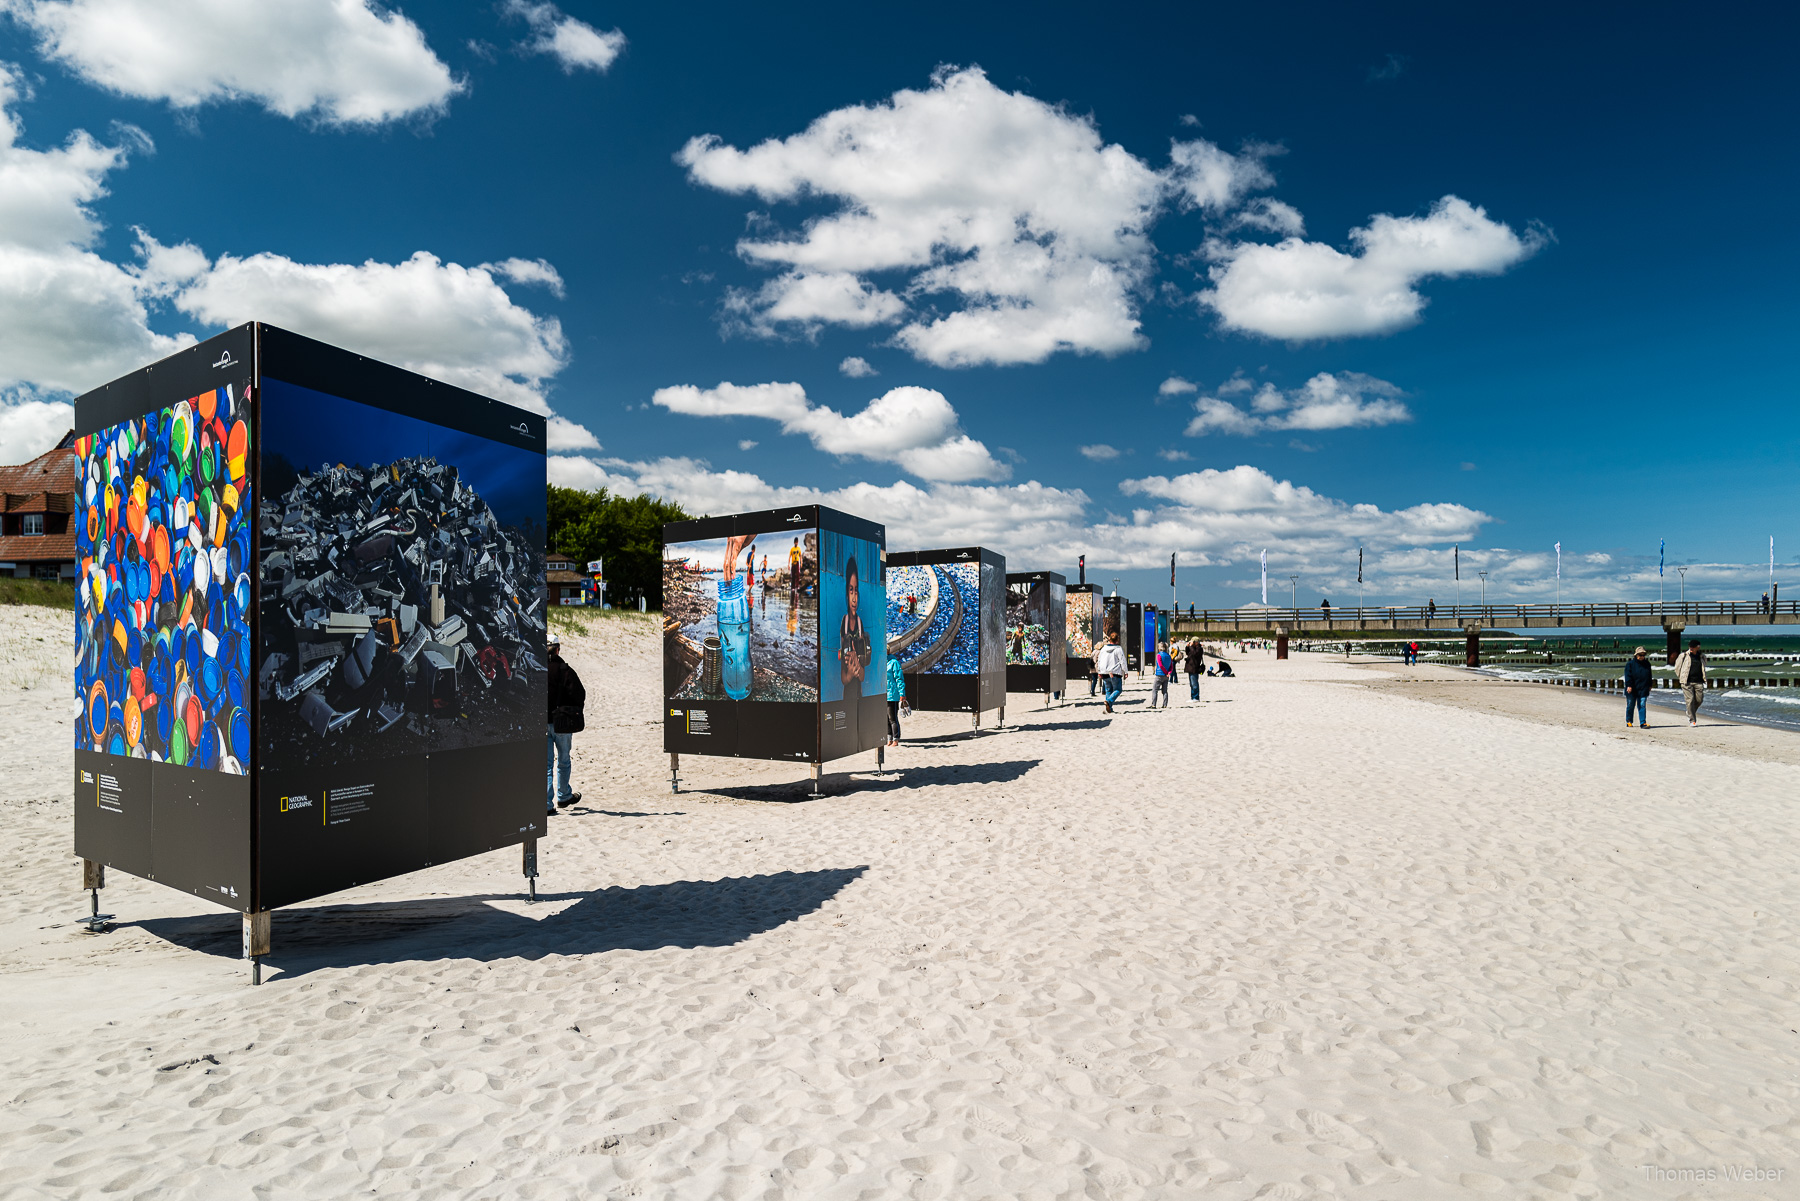 Umweltfotofestival 'horizonte zingst' 2019 an der Ostsee, Fotograf Thomas Weber aus Oldenburg